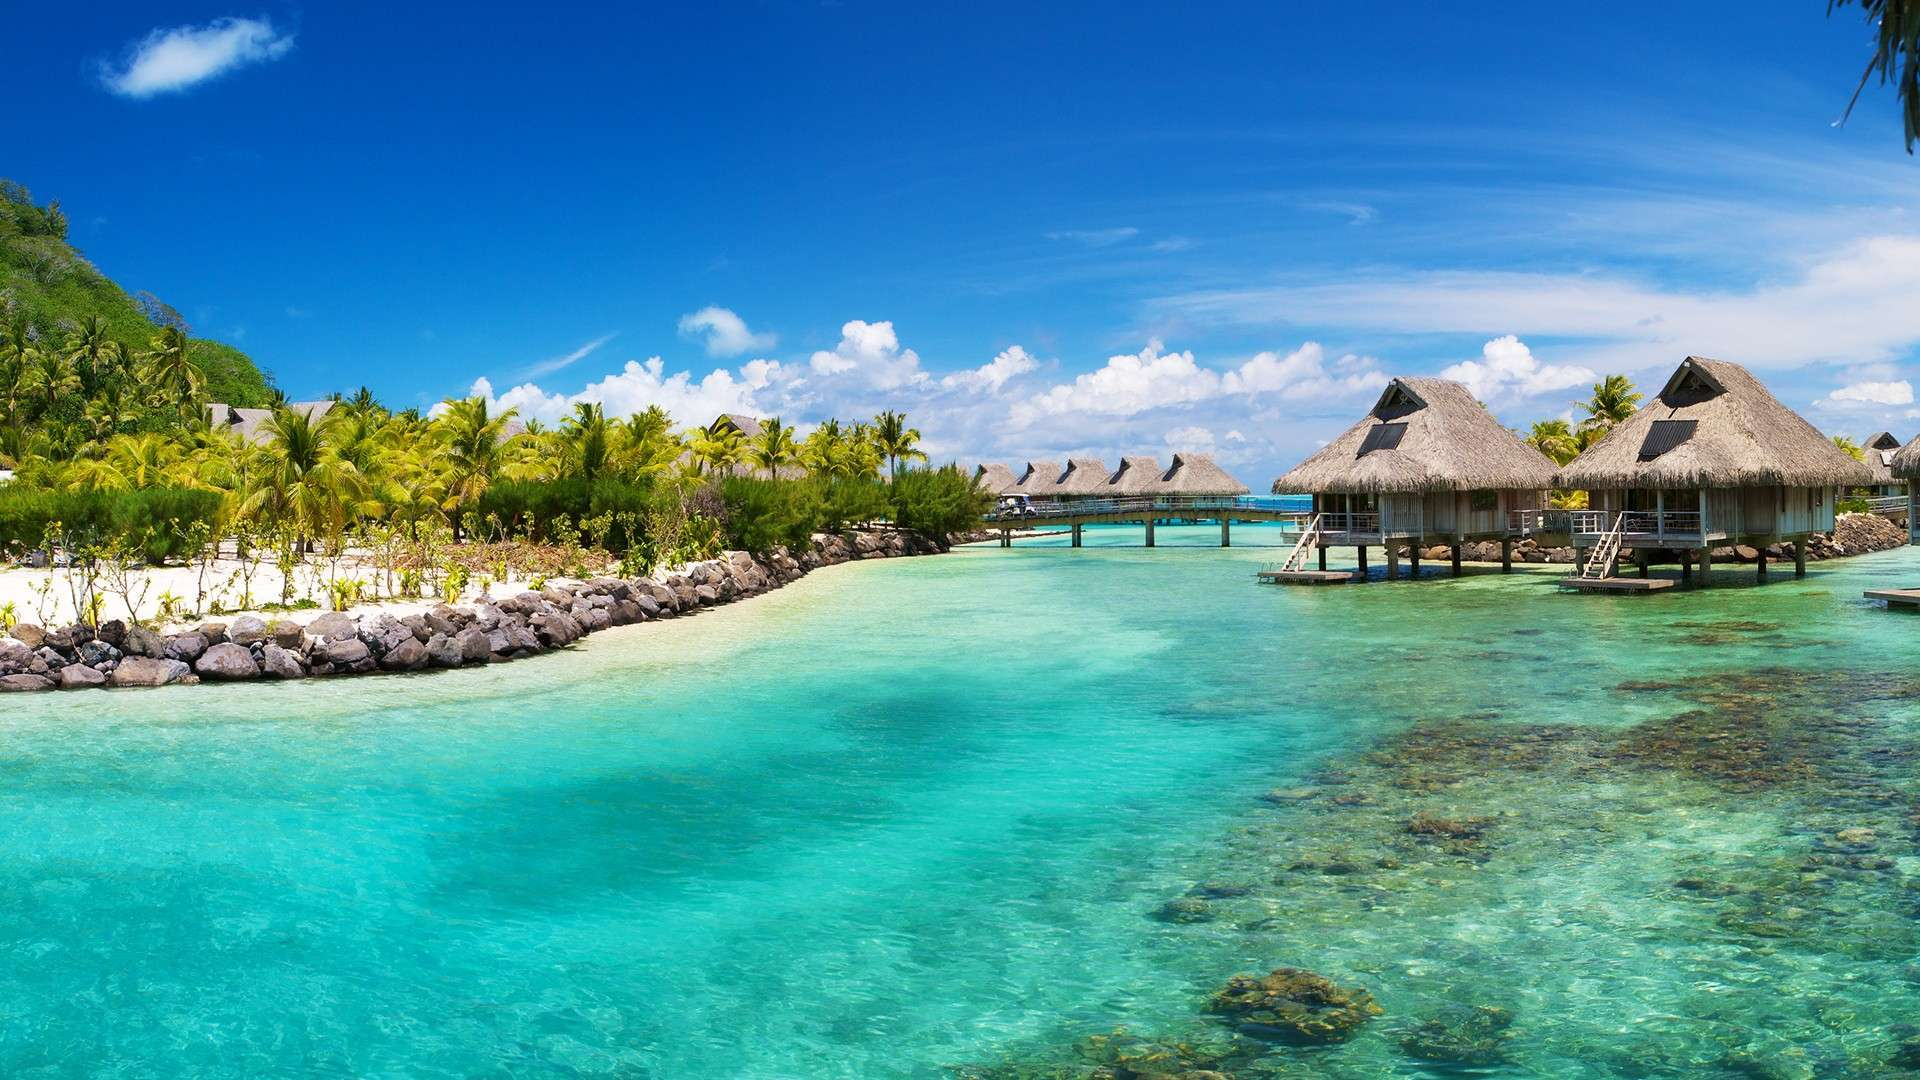 Tropical Island Desktop Wallpapers - Wallpaper Cave